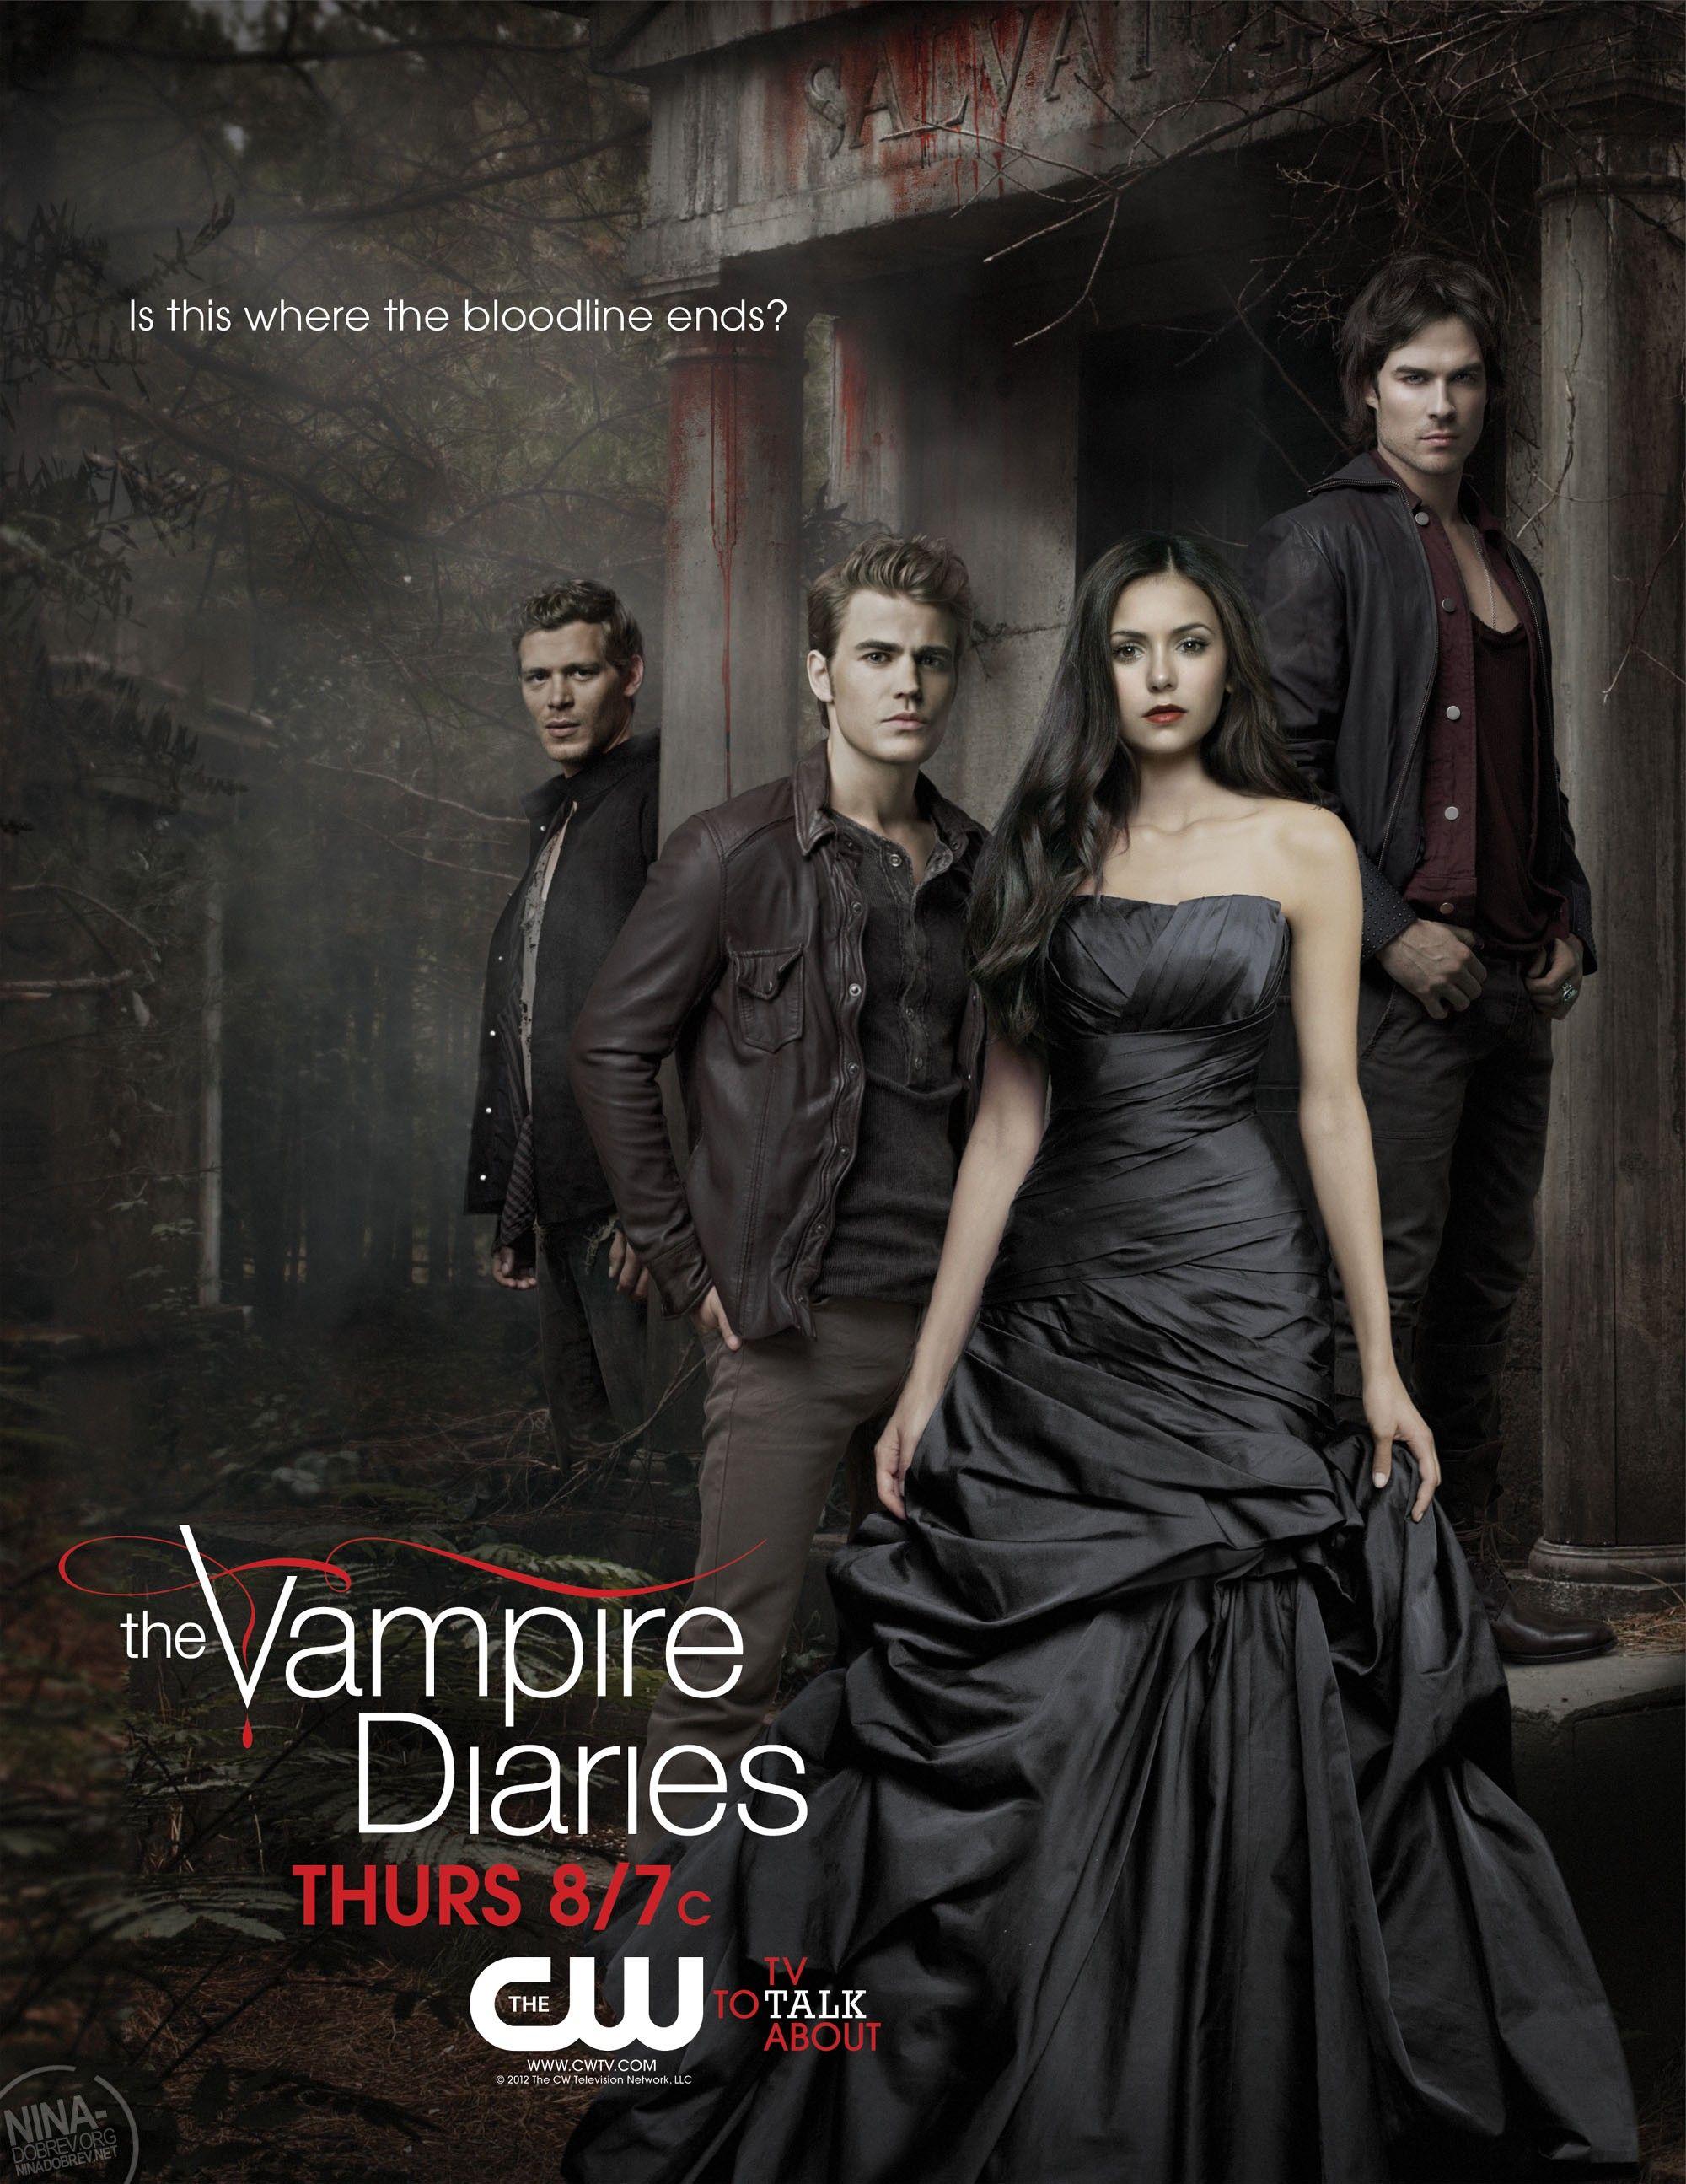 The Vampire Diaries Season 1 Posters Of Photos Albums